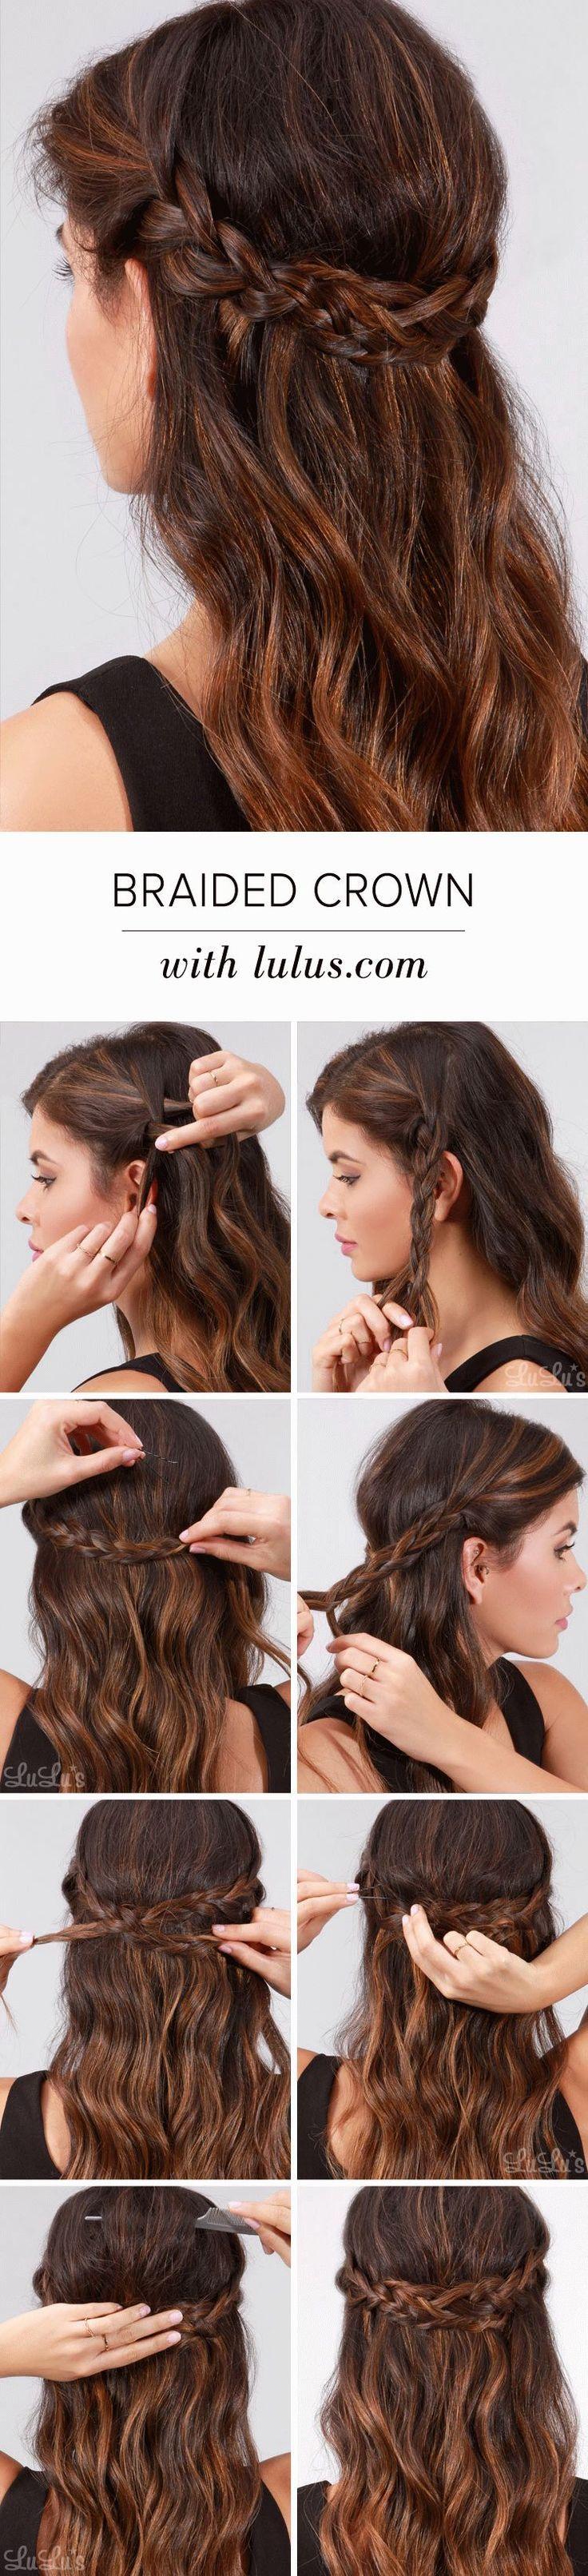 Braided crown hair tutorial braid crown crown hair and crown